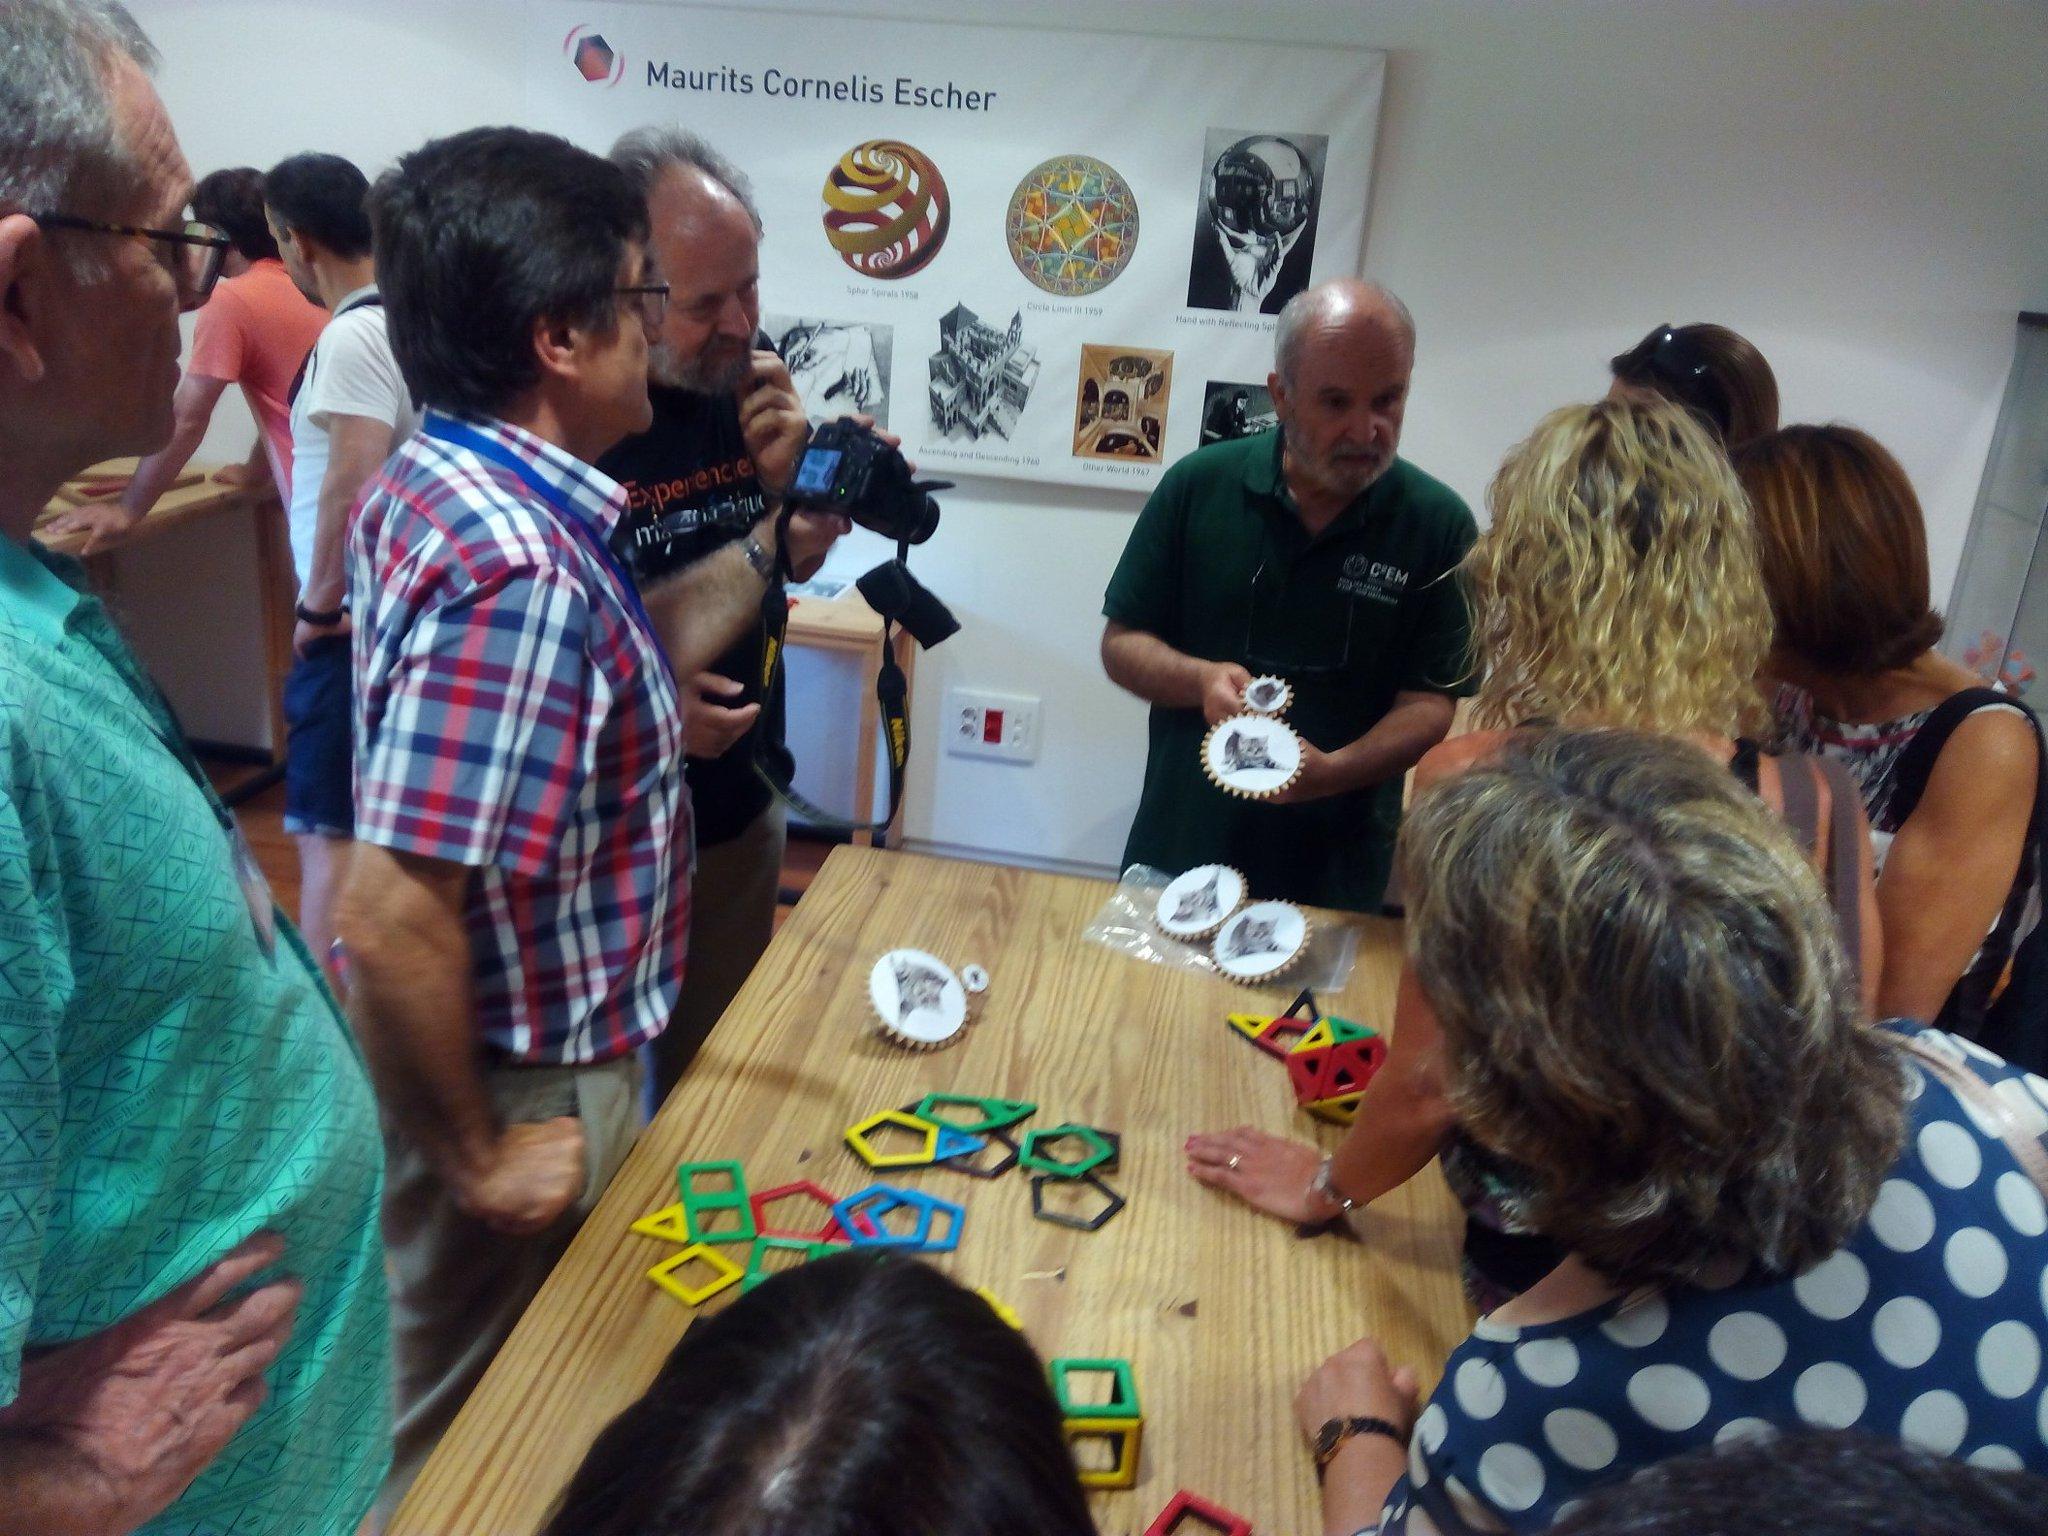 ". @JosepReyNadal ""jugar es educar la intuición"" @mmaca #c2em https://t.co/7JIc9u4EZM"